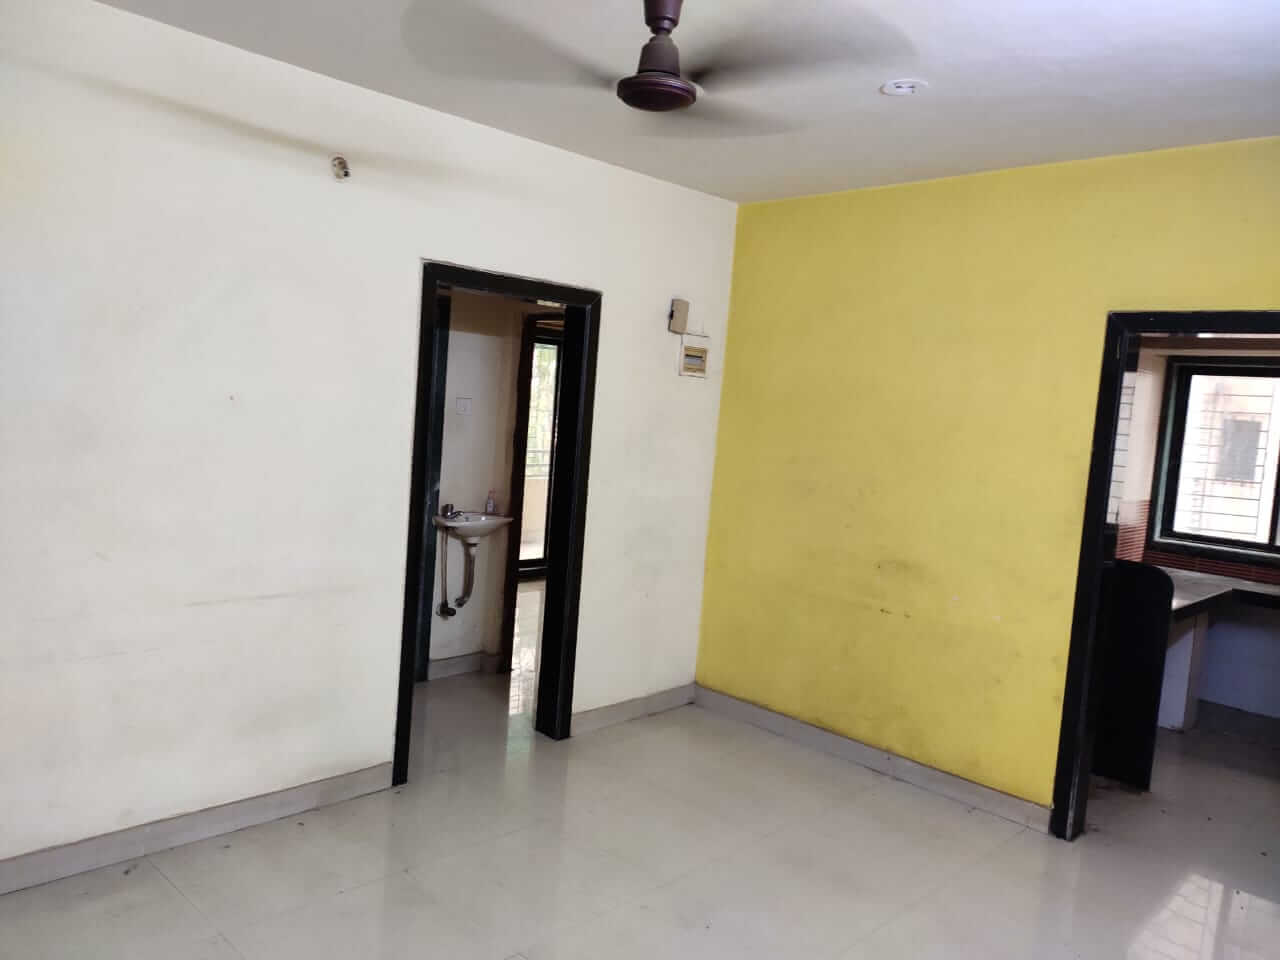 2 BHK Apartment / Flat for Rent 1000 Sq. Feet at Mumbai, Navi Mumbai